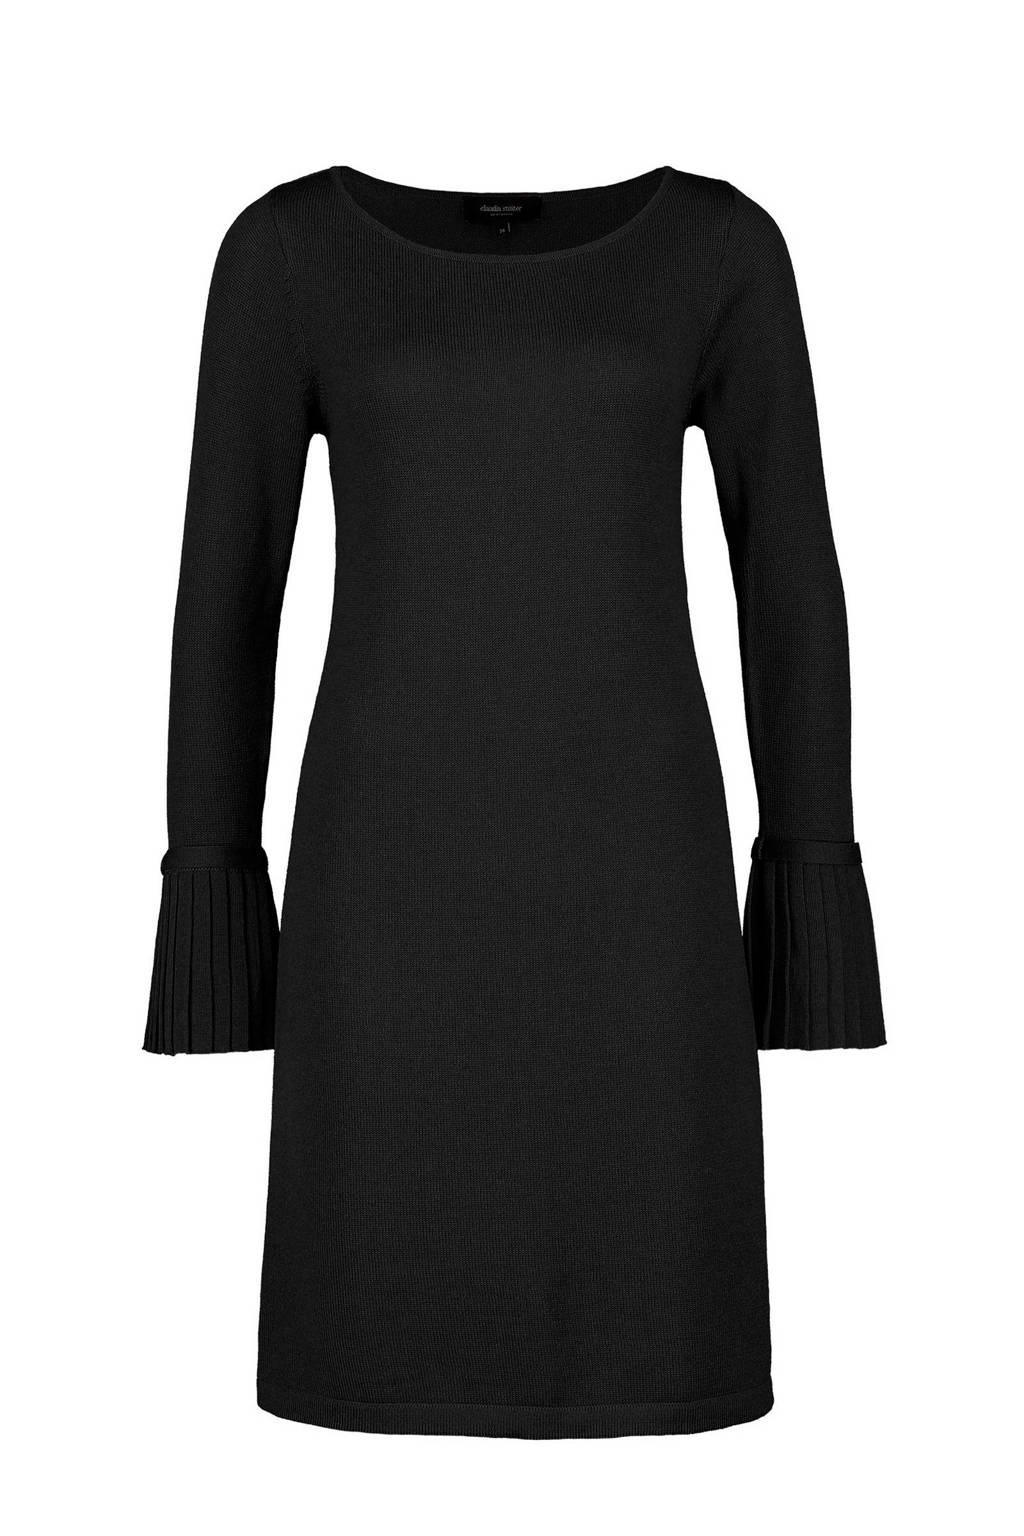 Claudia Sträter gebreide wollen jurk zwart, Zwart